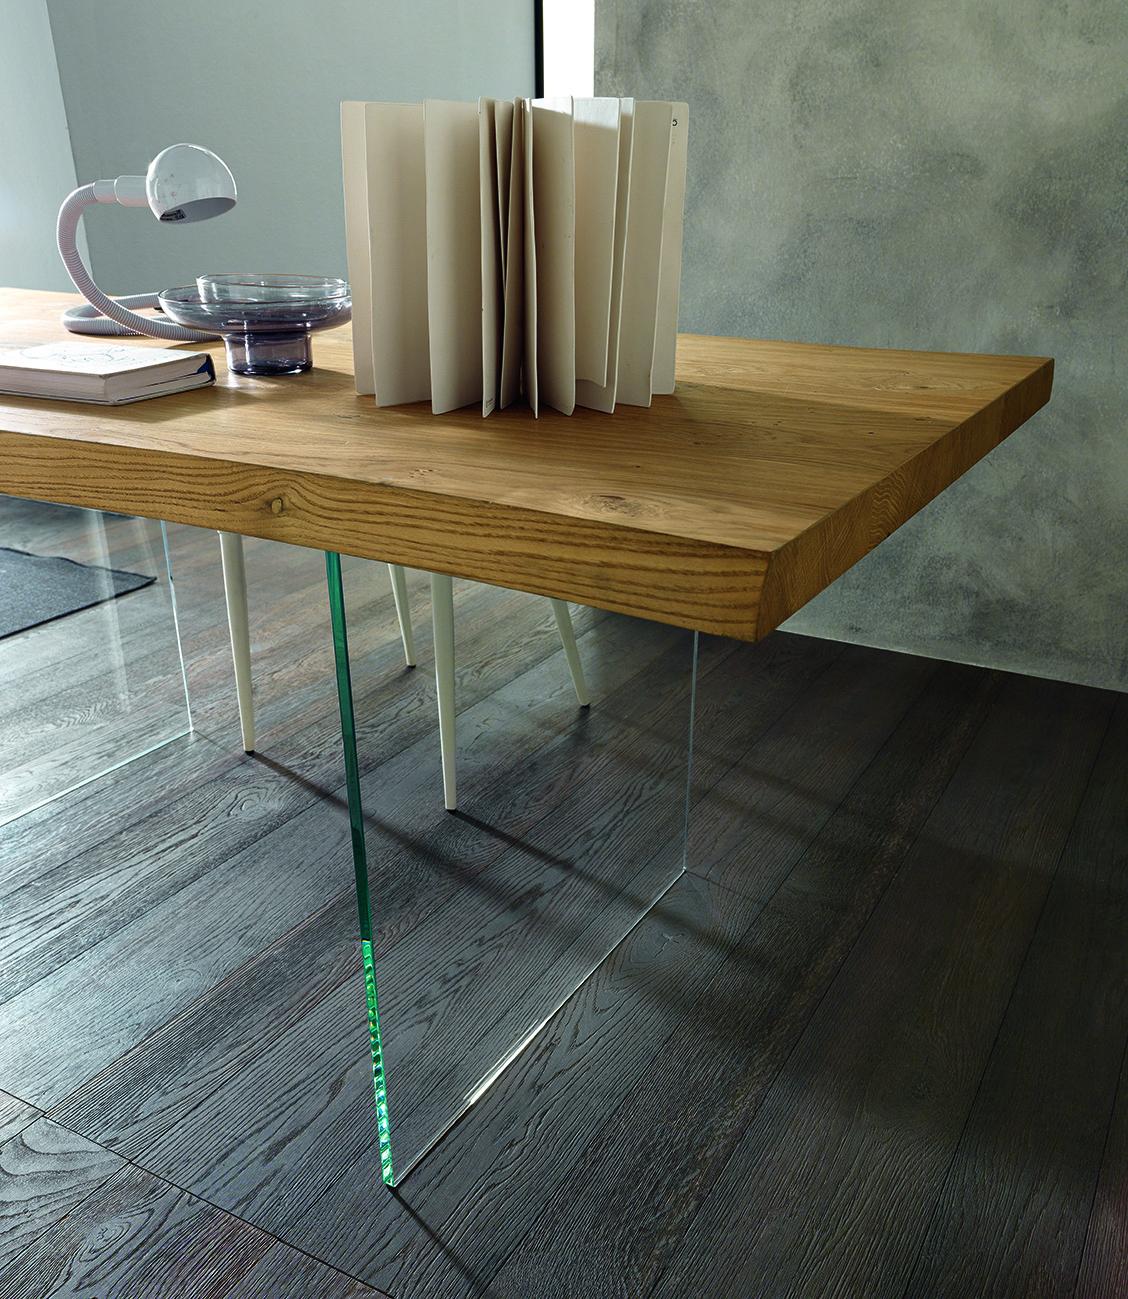 Table de repas avec pieds en verre